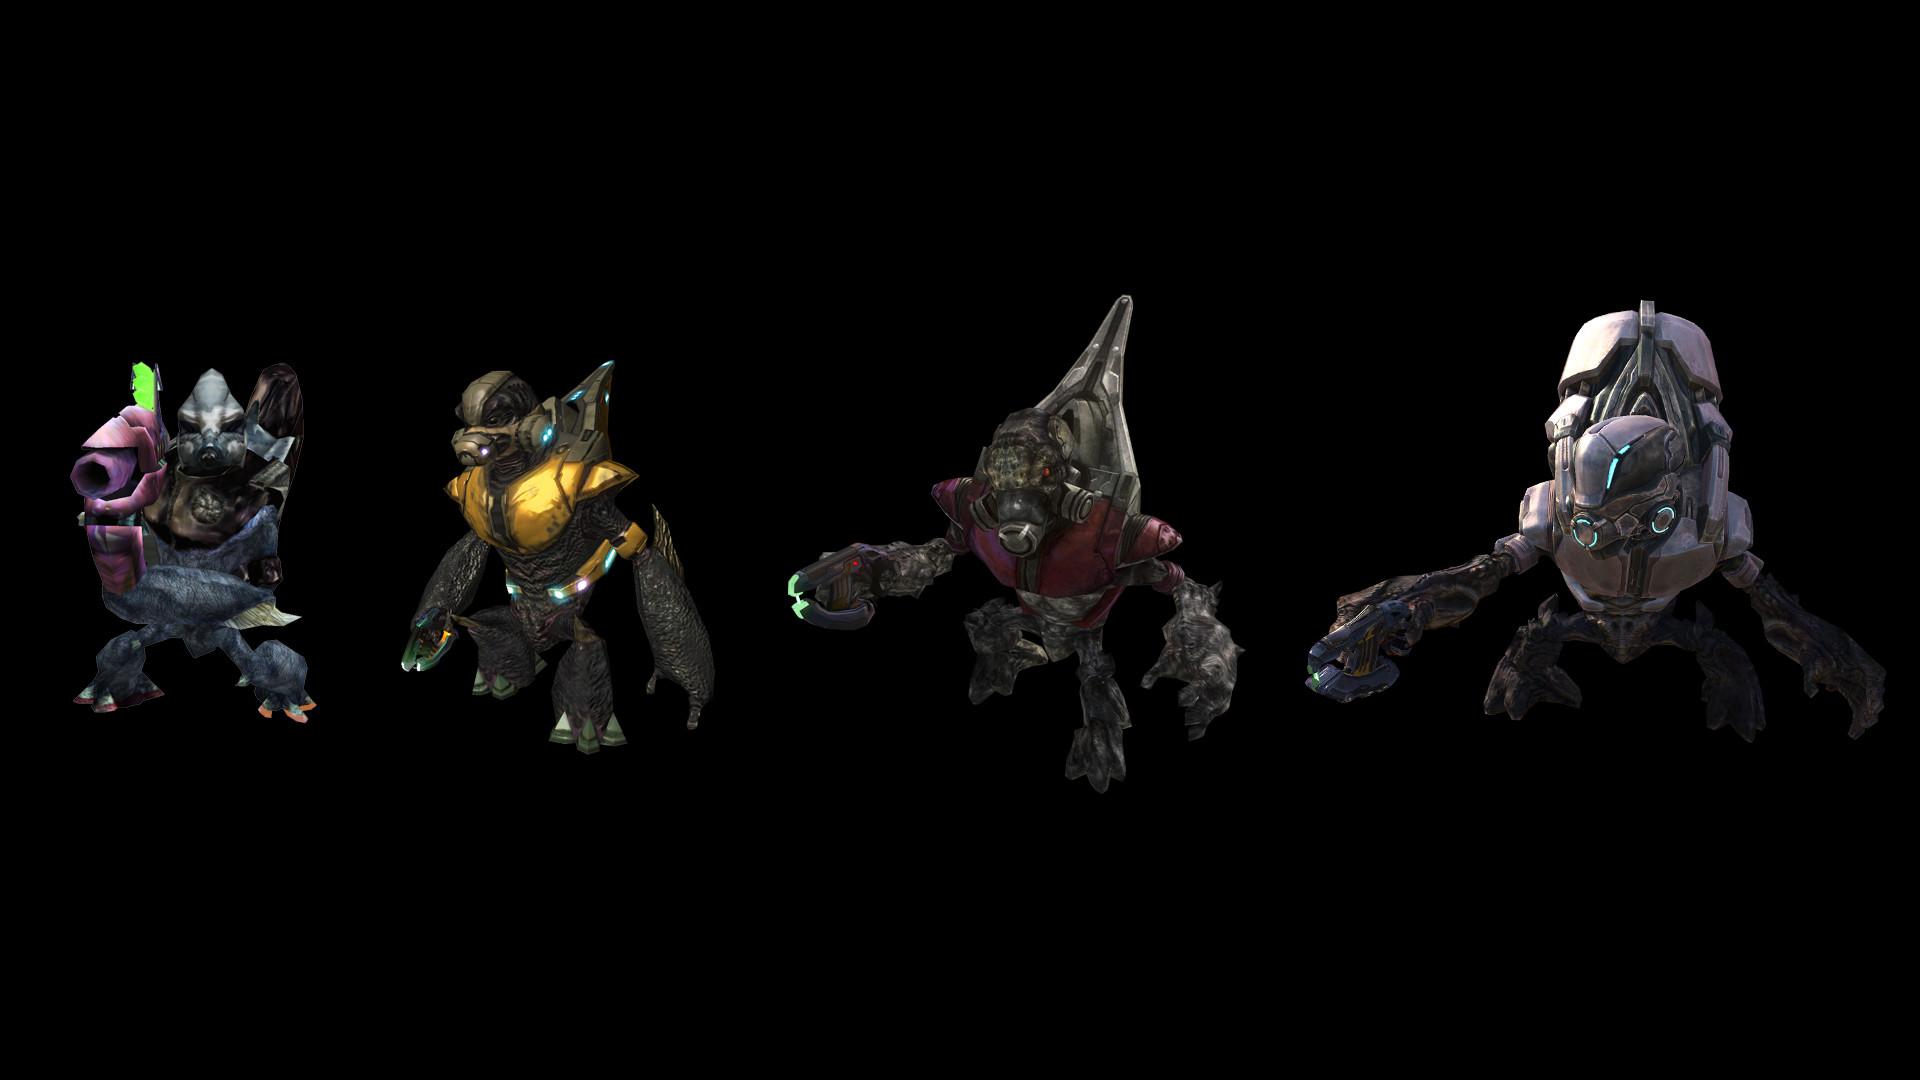 1331 – Covenant Grunt: Evolution of Grunt models, from Halo: Combat Evolved  to